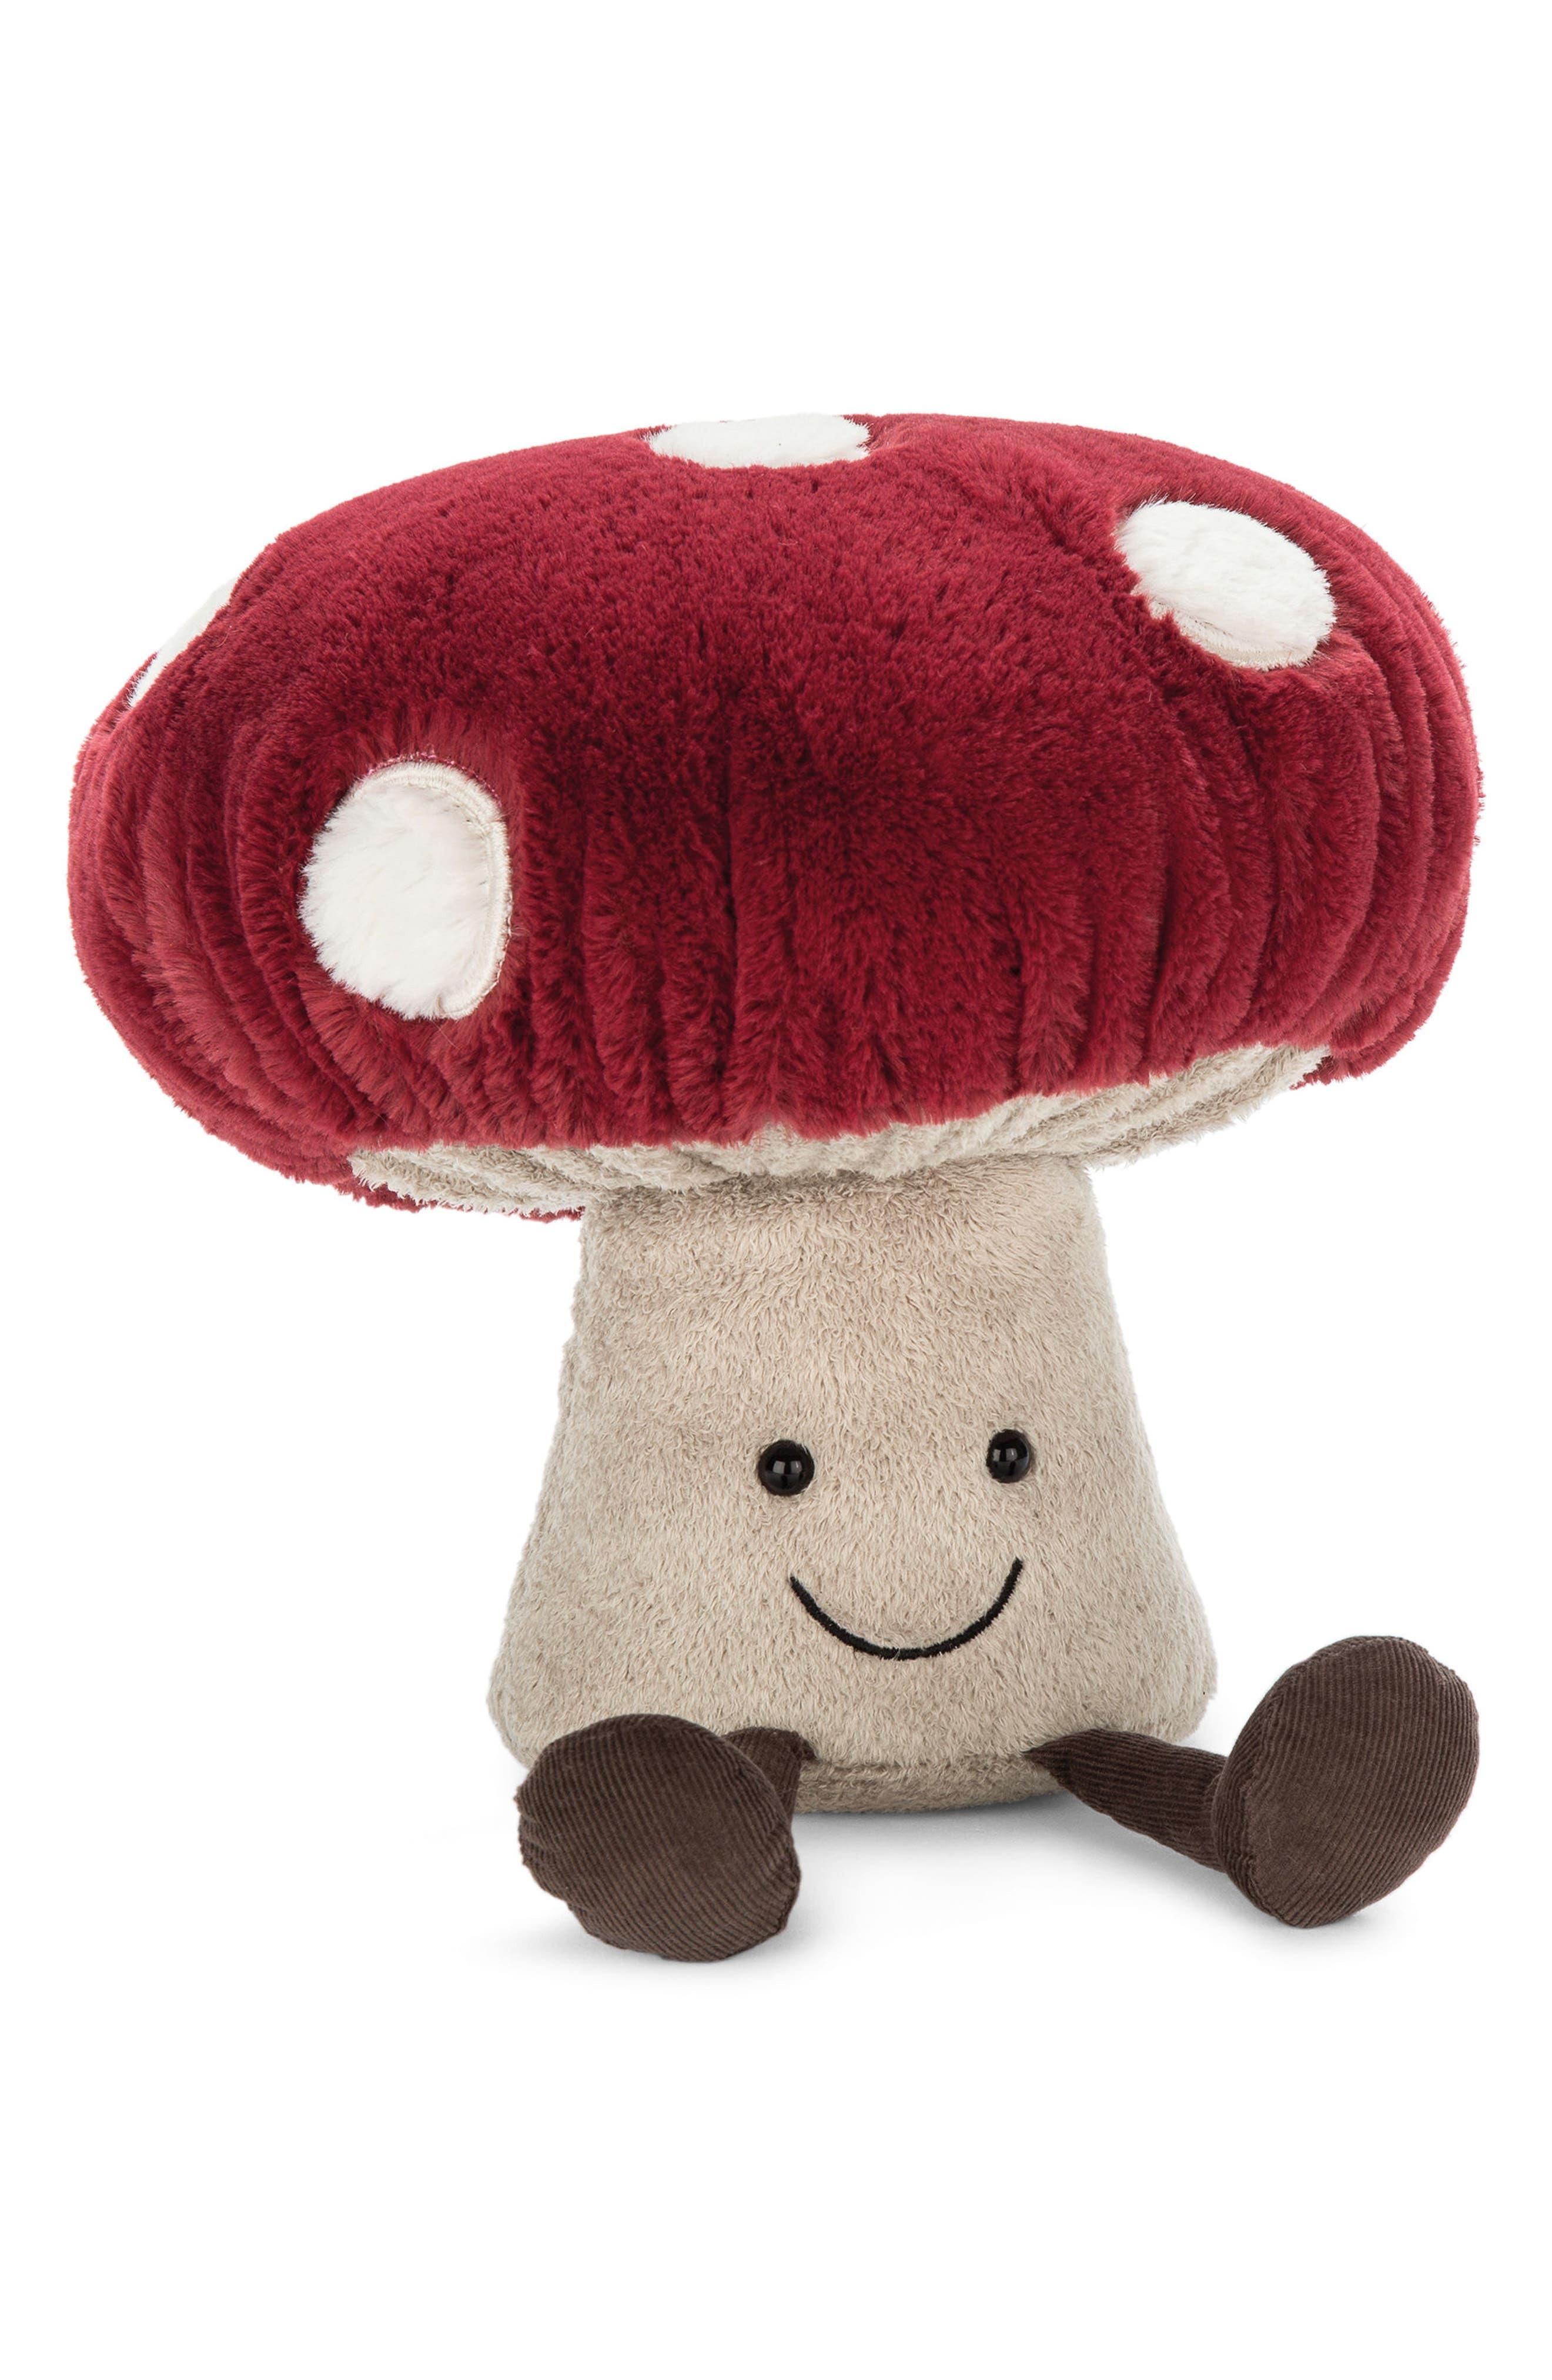 Amuseable Mushroom Plush Toy,                             Main thumbnail 1, color,                             Mushroom